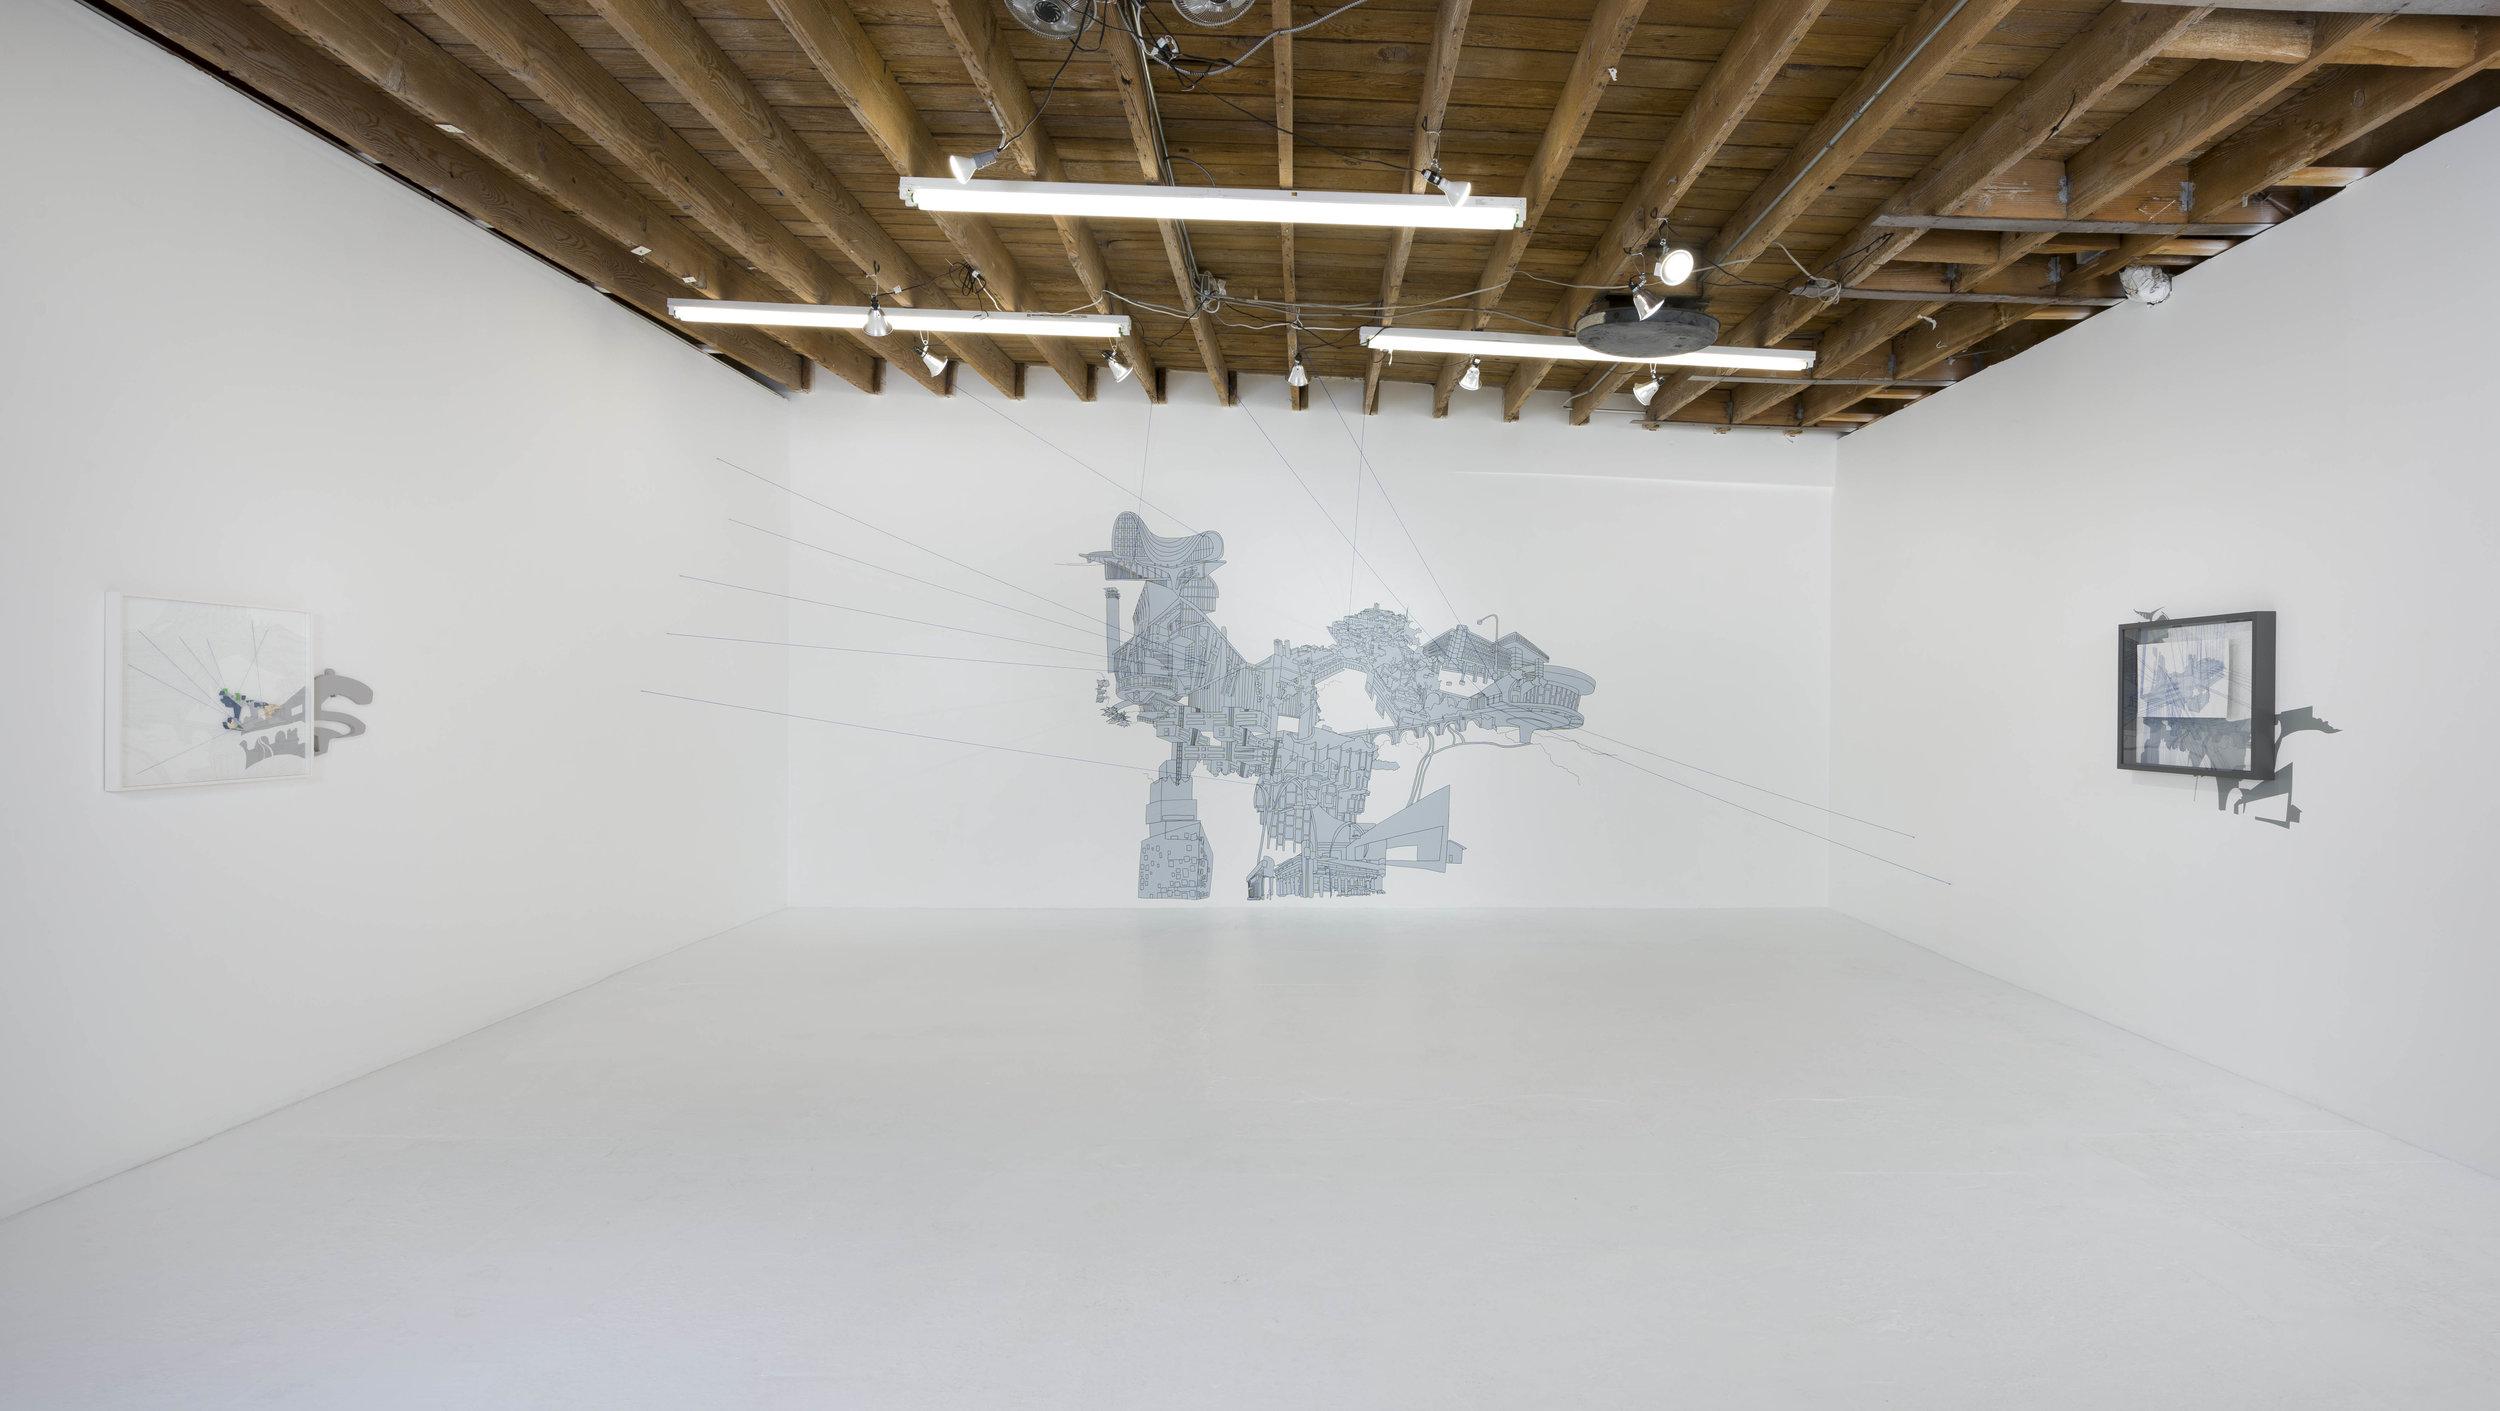 Kim Schoenstadt, 'Context v. Perspective'. Installation view, Chimento Contemporary. Photo: Ruben Diaz.